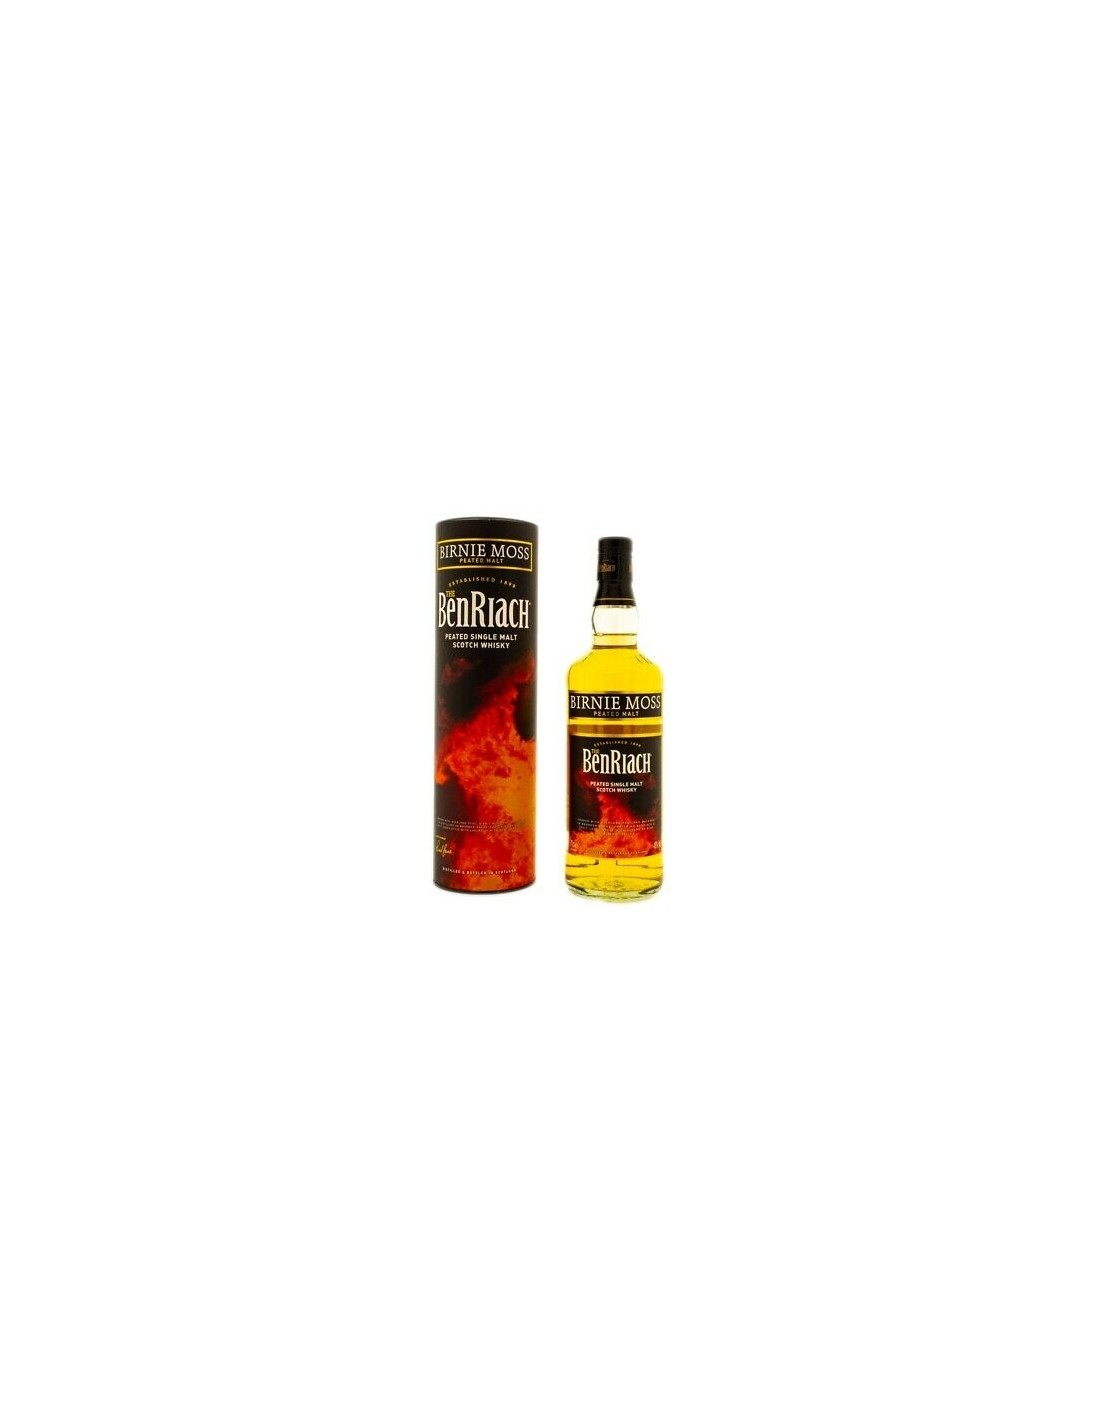 Whisky BenRiach Birnie Moss, 48% alc., 0.7L, Irlanda